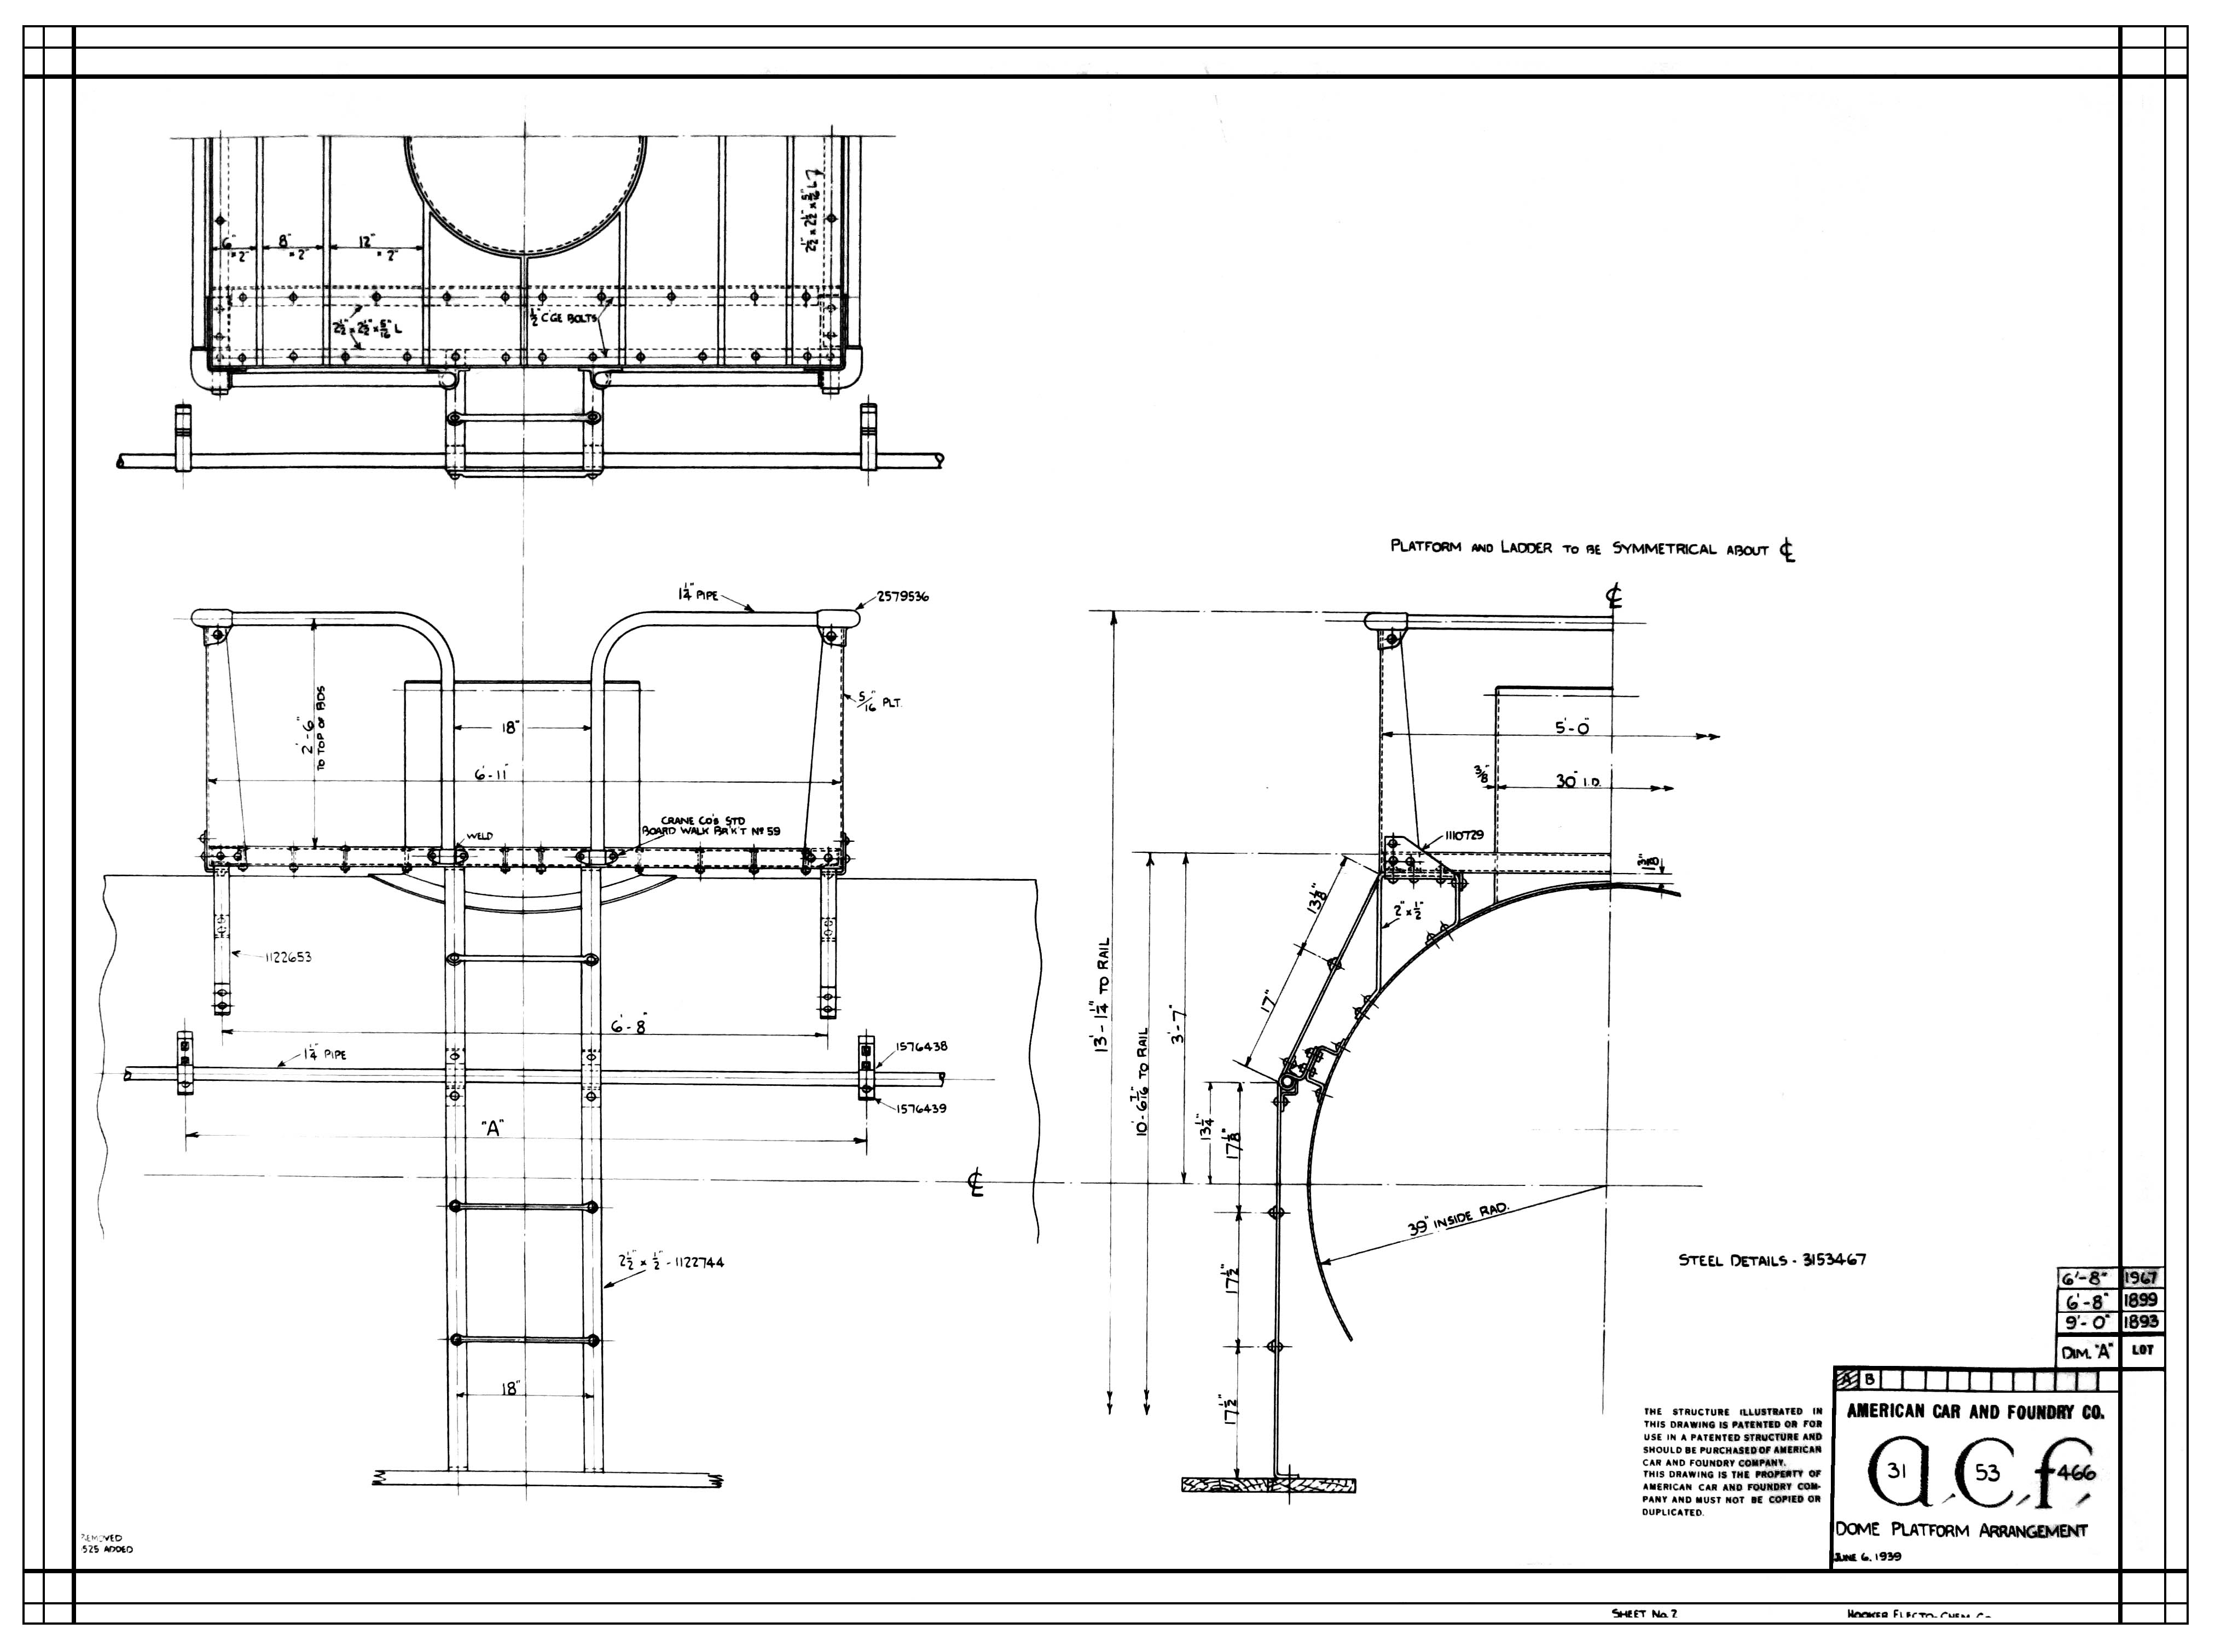 Design of a car pdf - Special Detail On Hokx 215 Pdf File Merrimac 7000k Tank Car Drawing Ab Brake System Drawing